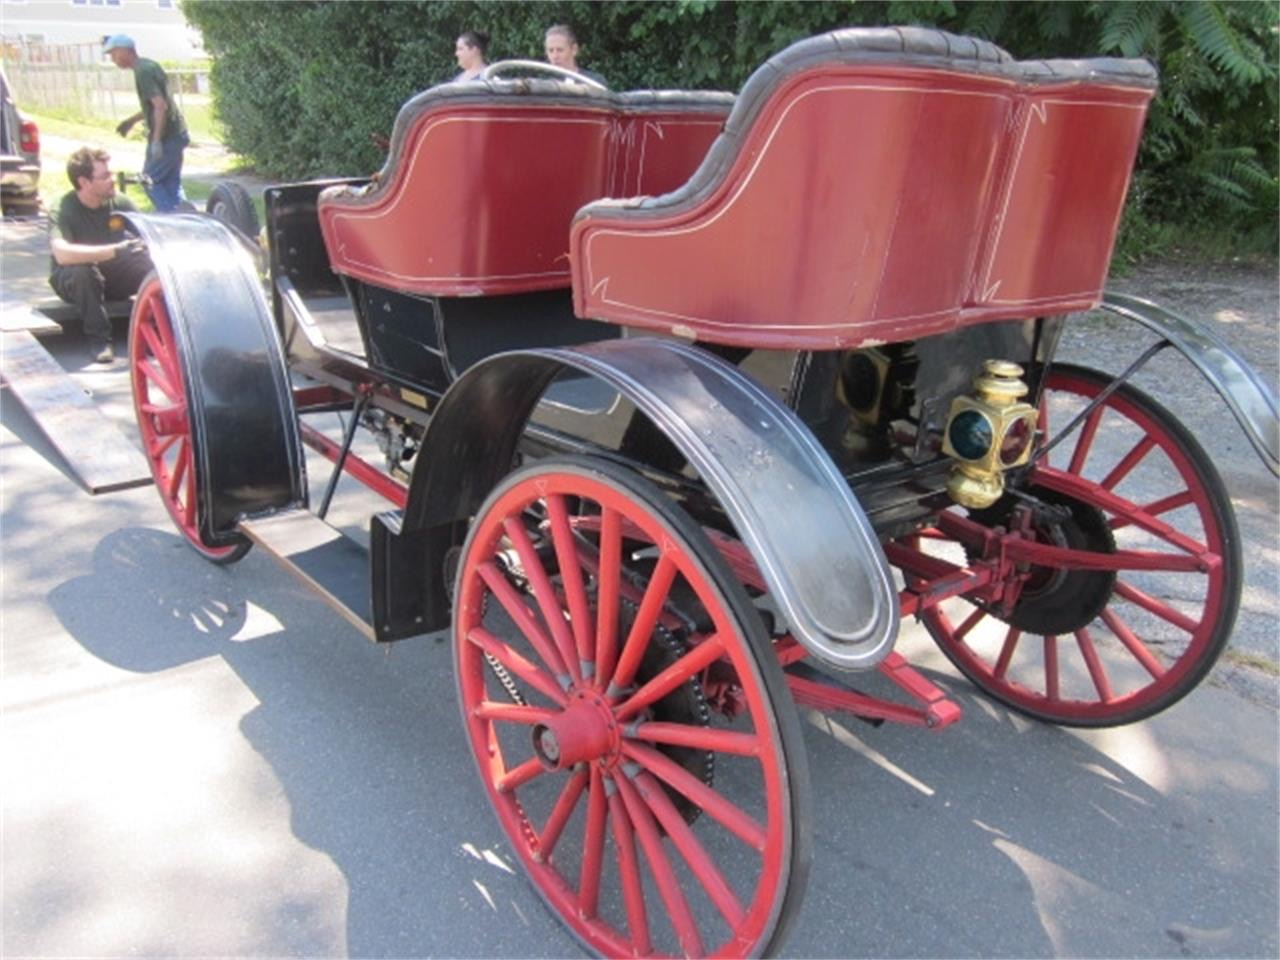 hybrid, 1908 Tudhope McIntrye was Canadian-American hybrid, ClassicCars.com Journal